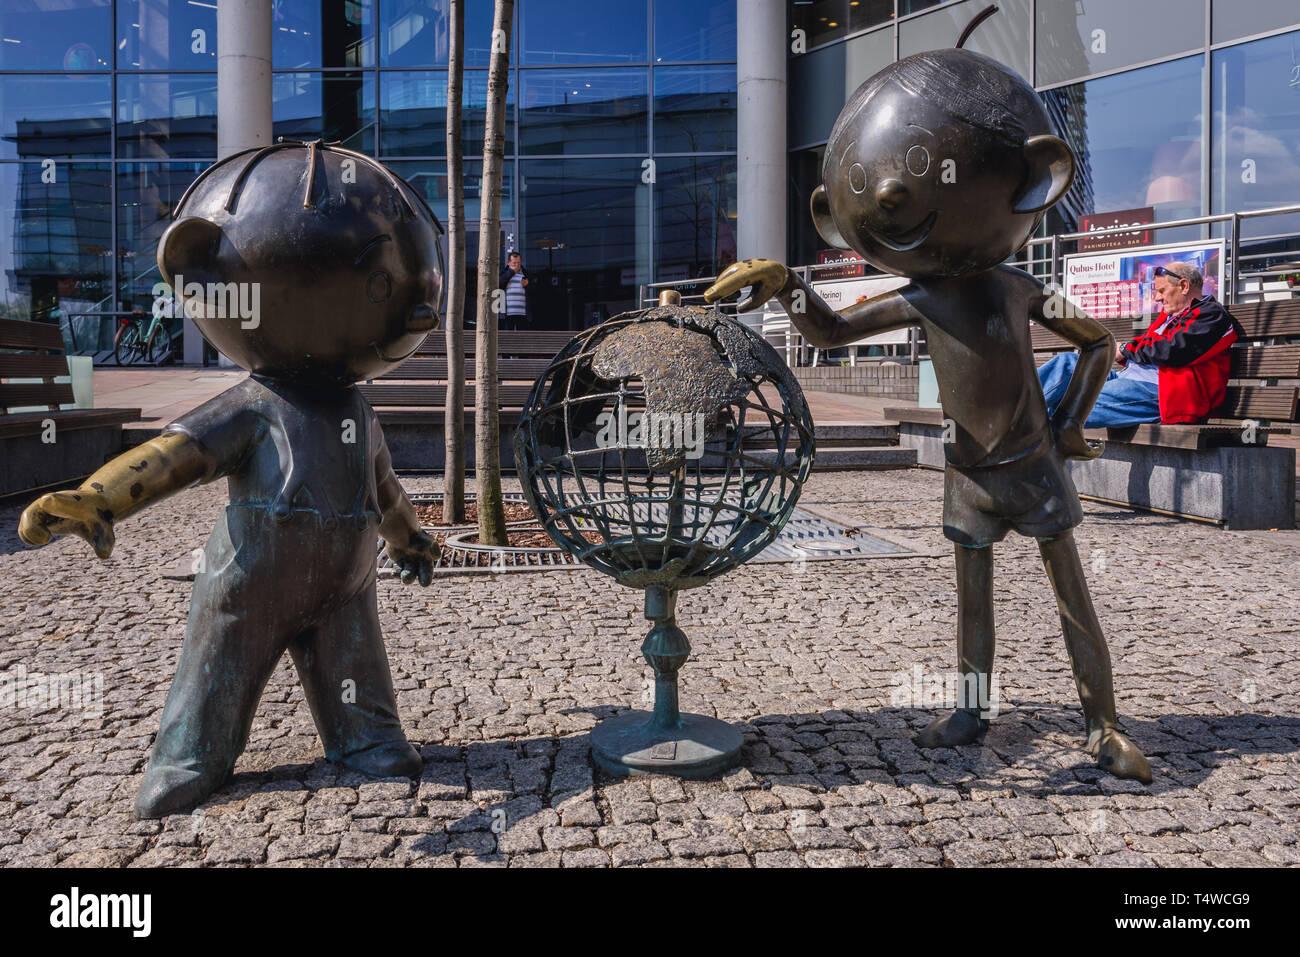 Bolek and Lolek Polish cartoon characters monument in Bielsko-Biala city in Poland - Stock Image